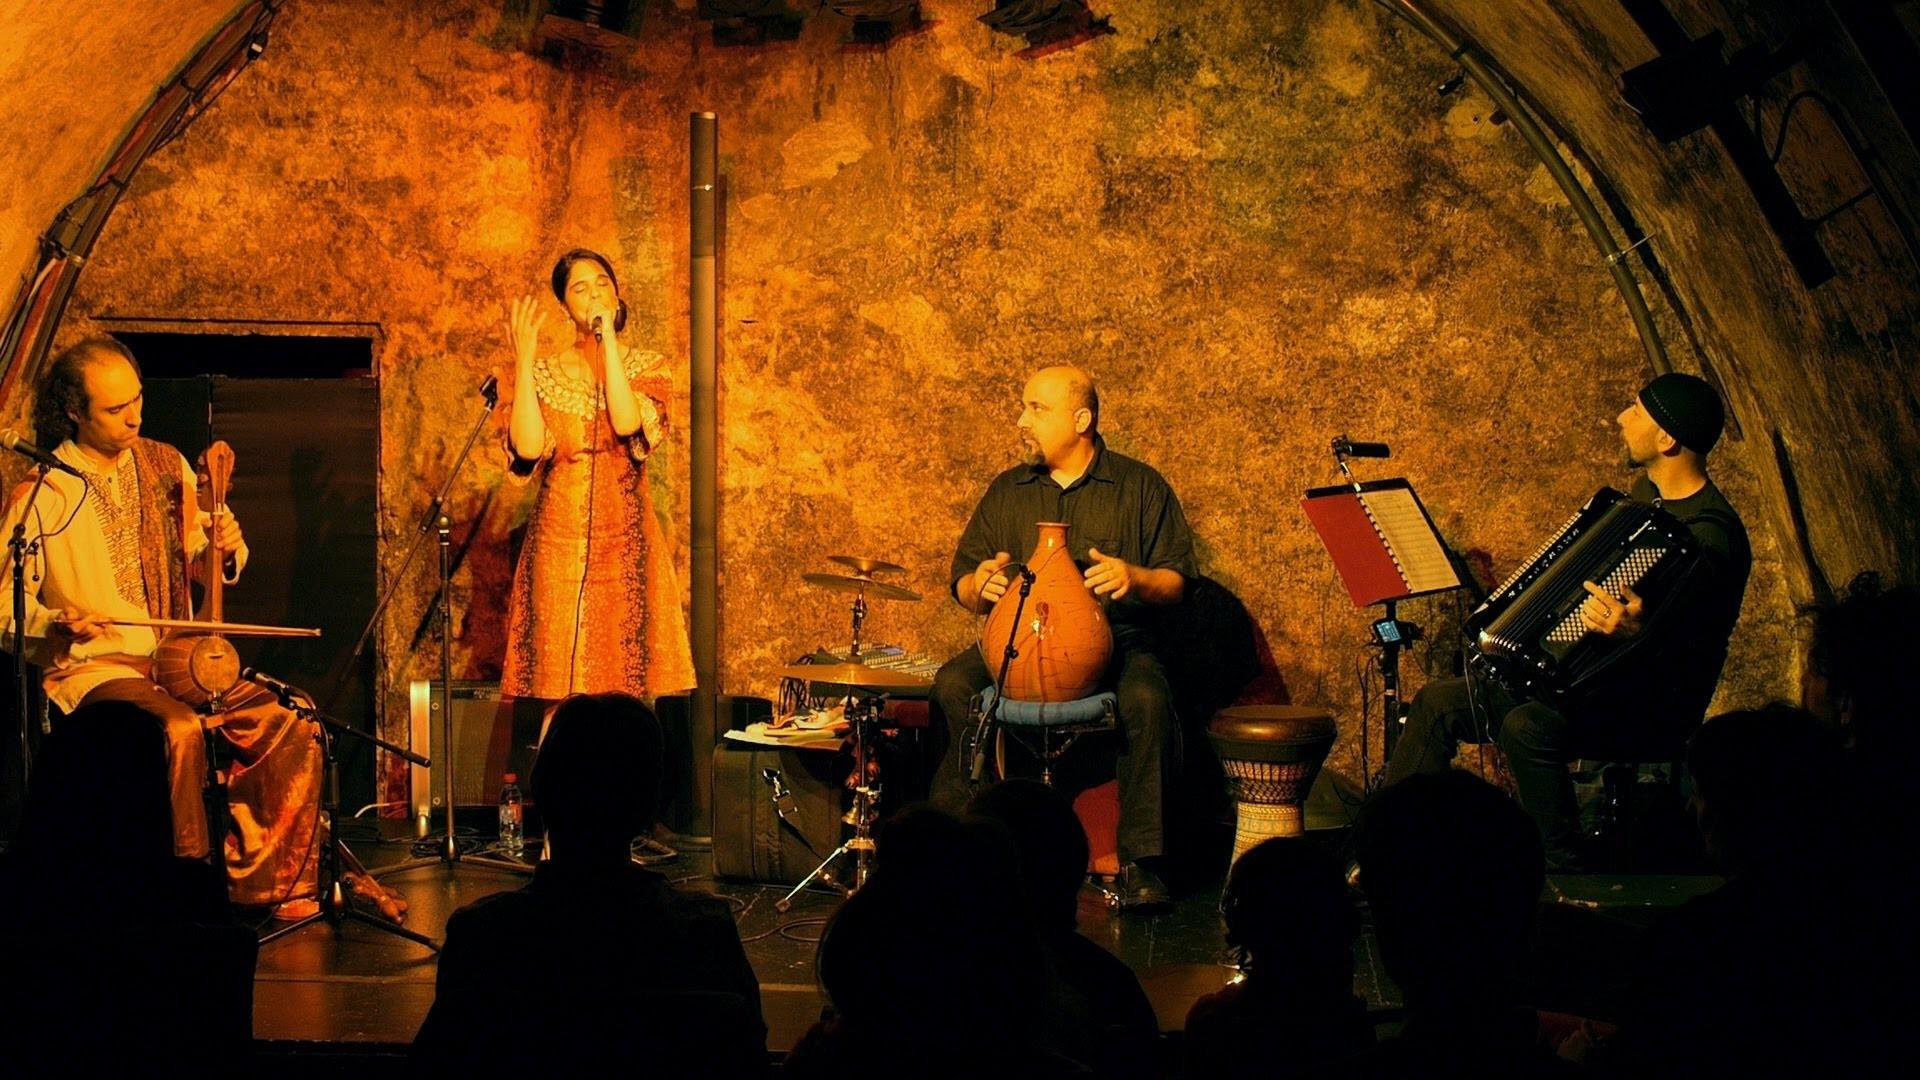 Jewish Sepahrdi songs – La Serena & Dos amantes   Kedem Ensemble